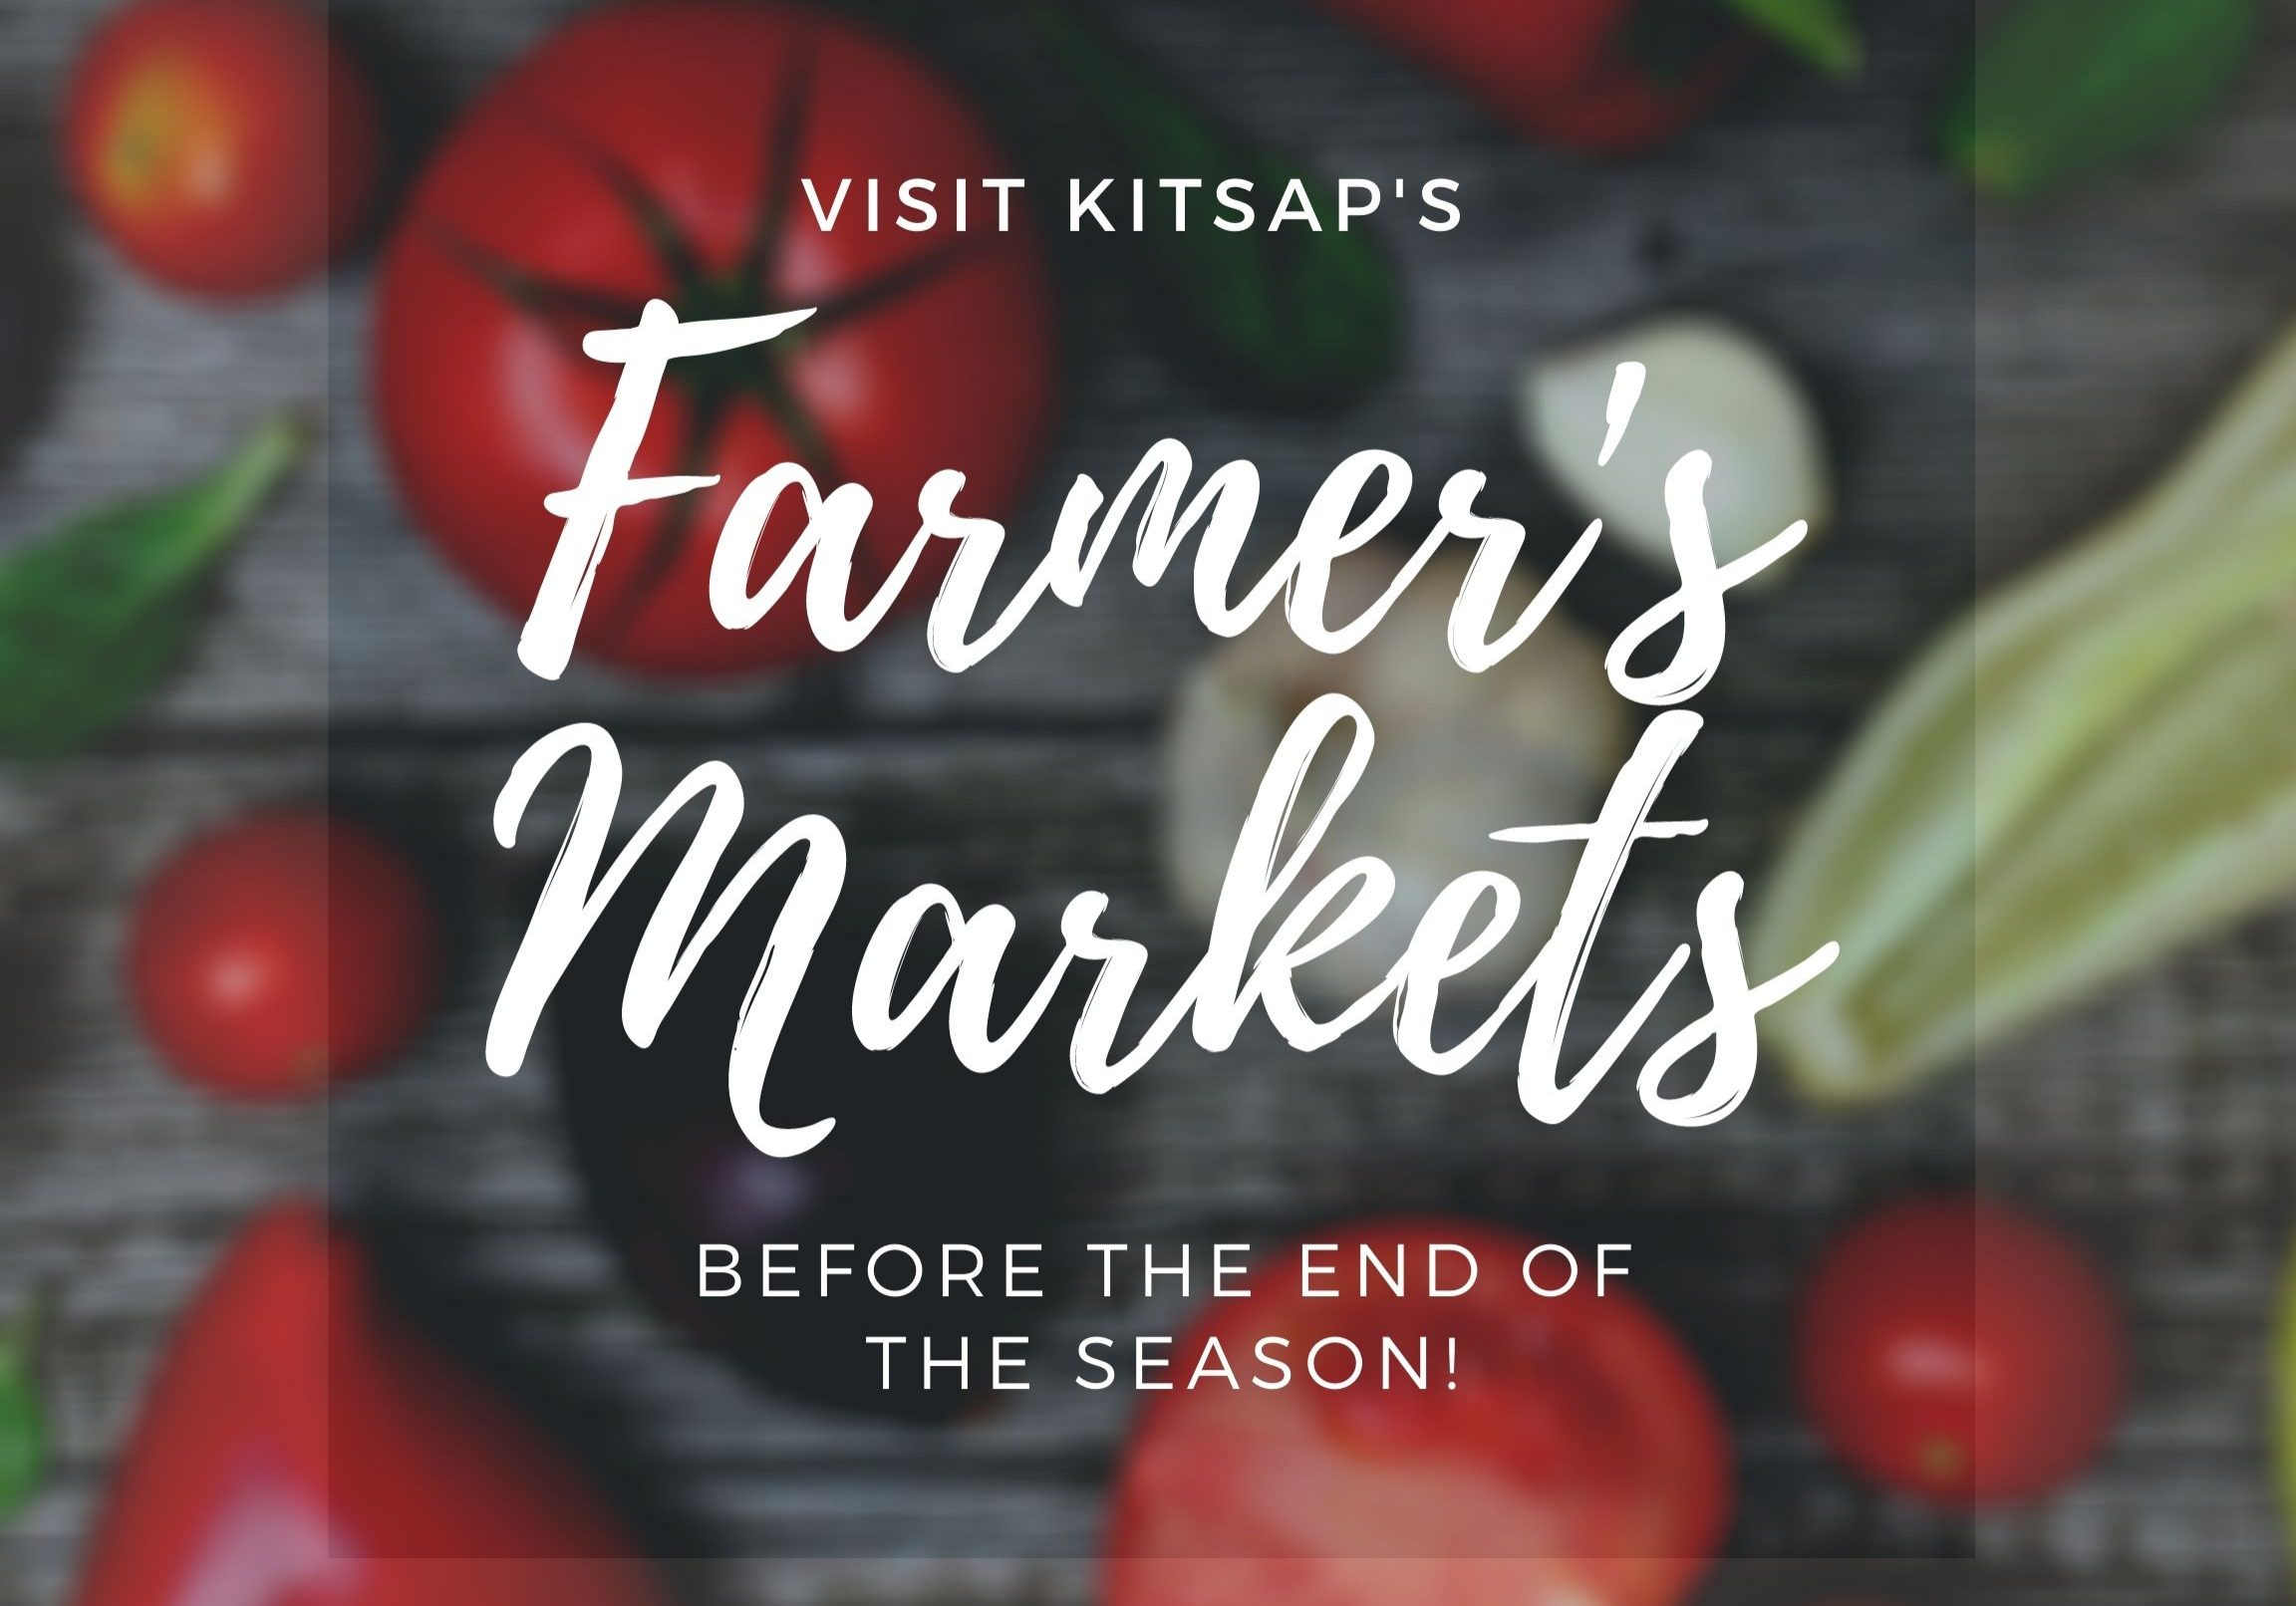 Catch the farmer's markets in Kitsap County before the fall/winter season closing!